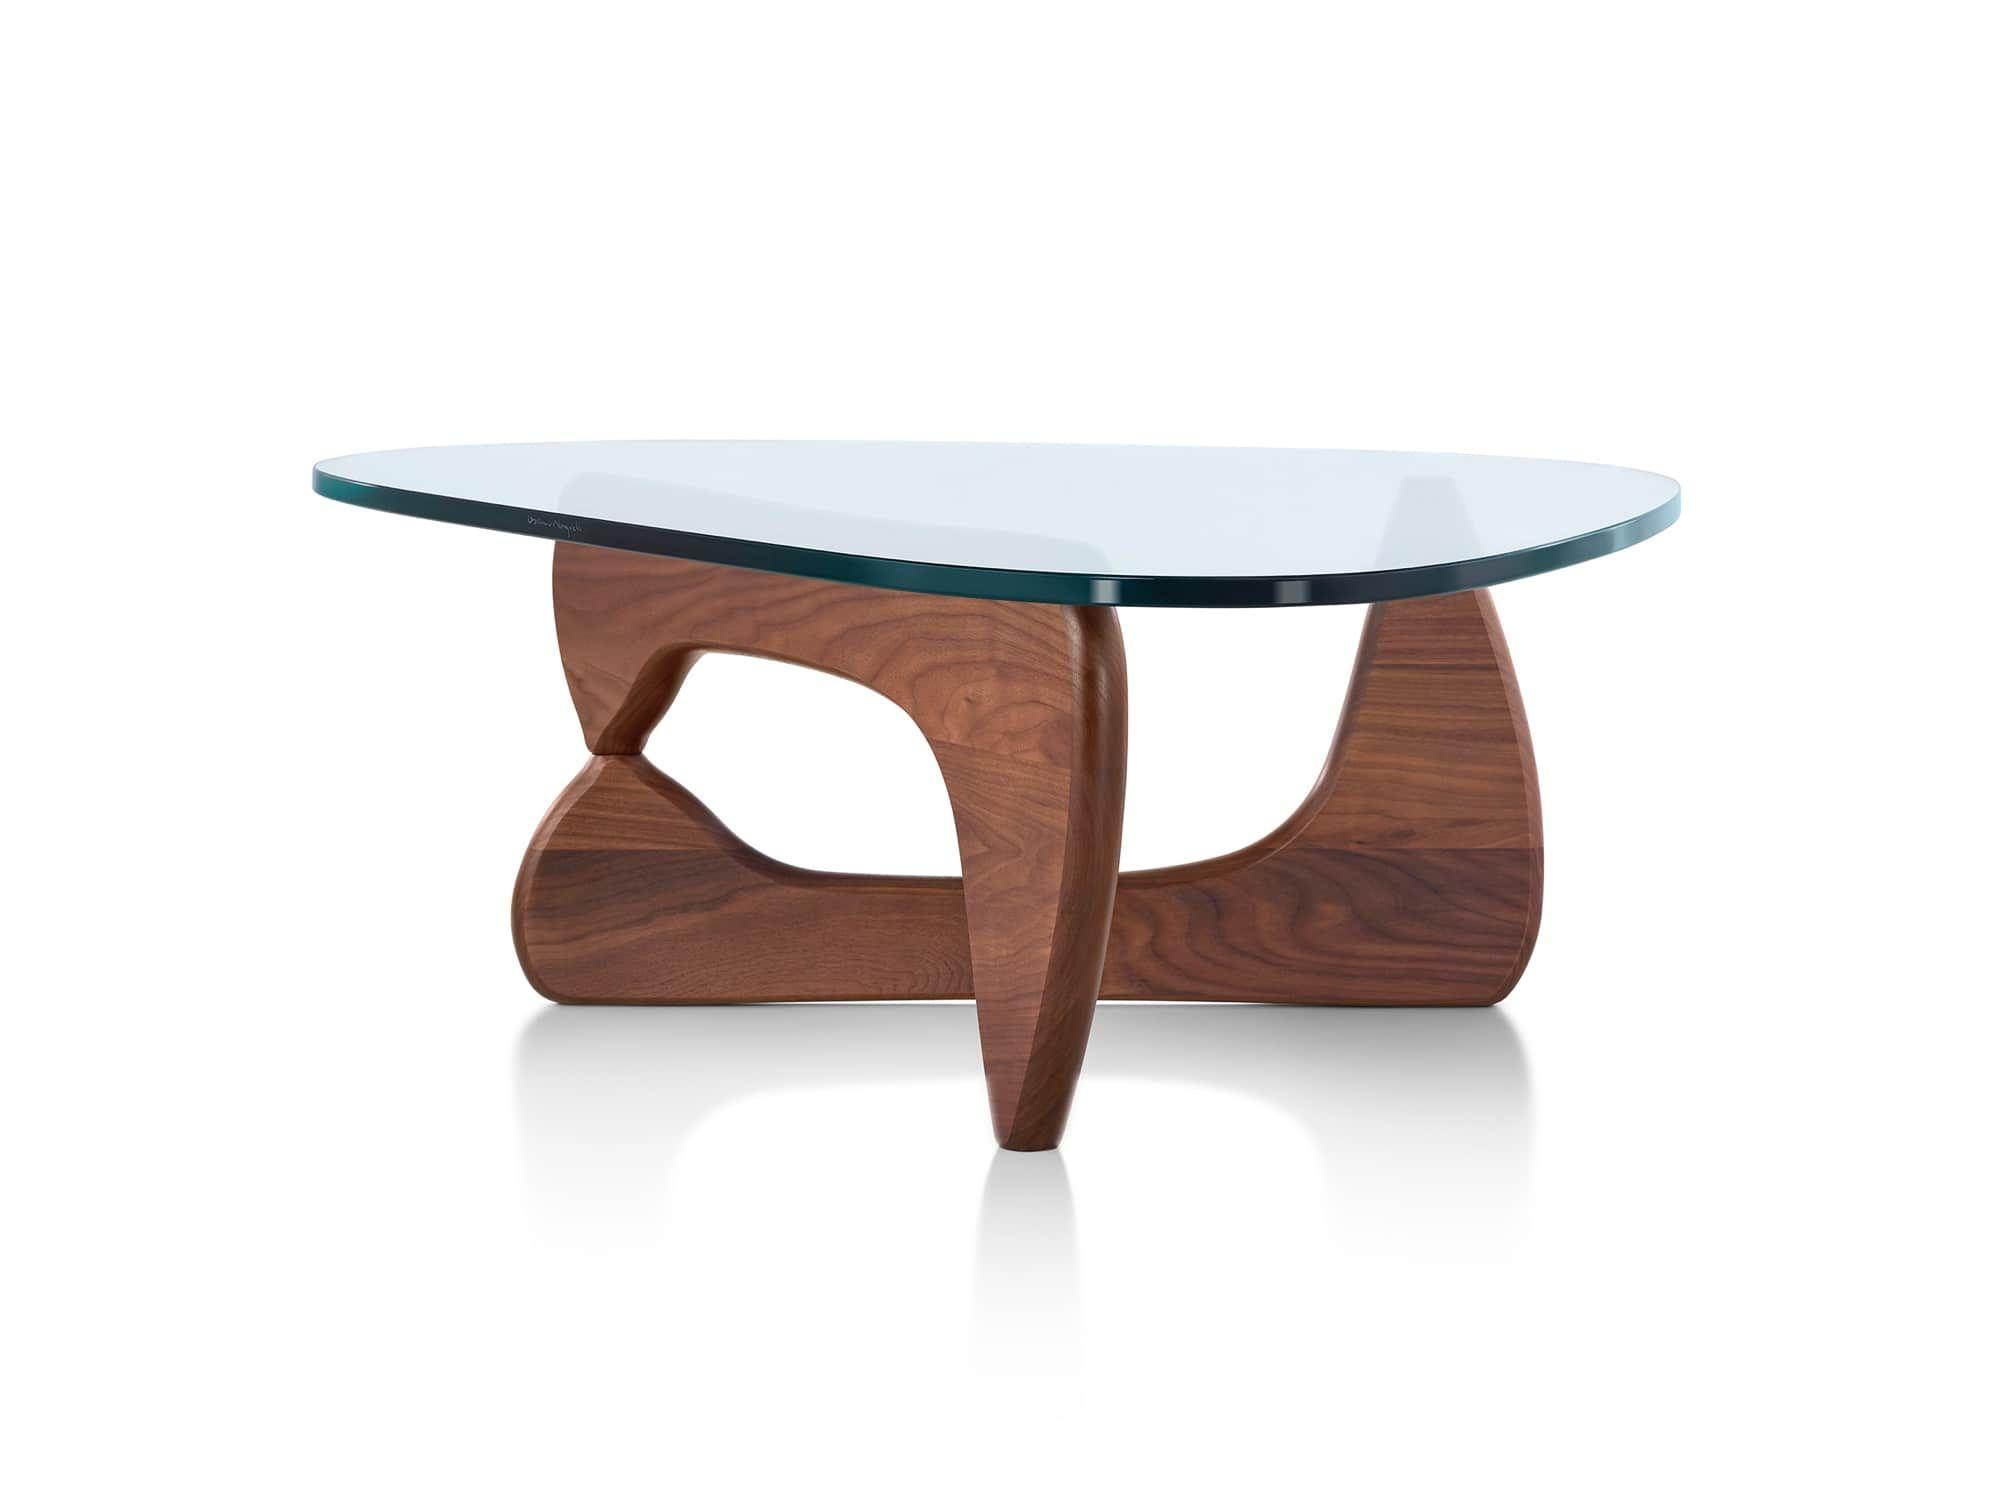 Noguchi Table Herman Miller Noguchi Coffee Table Noguchi Table Coffee Table Isamu Noguchi [ 1500 x 2000 Pixel ]